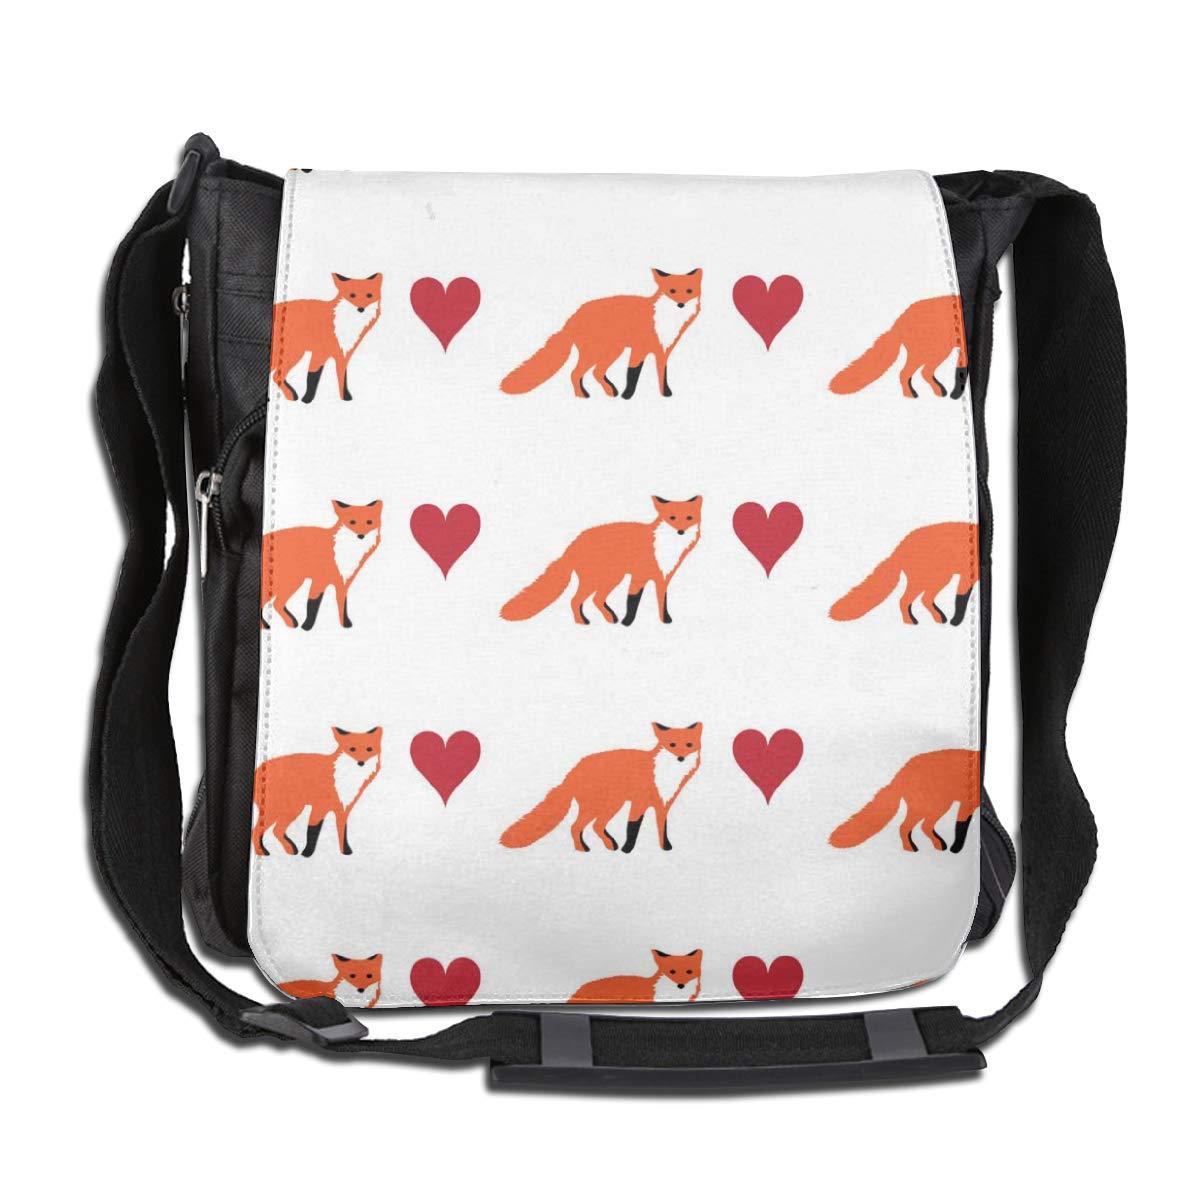 Fox Love And Kiss Men Women Inspirational Satchel Messenger Bags Crossbody Sling Working Bag Travel Shoulder Bags Office//School